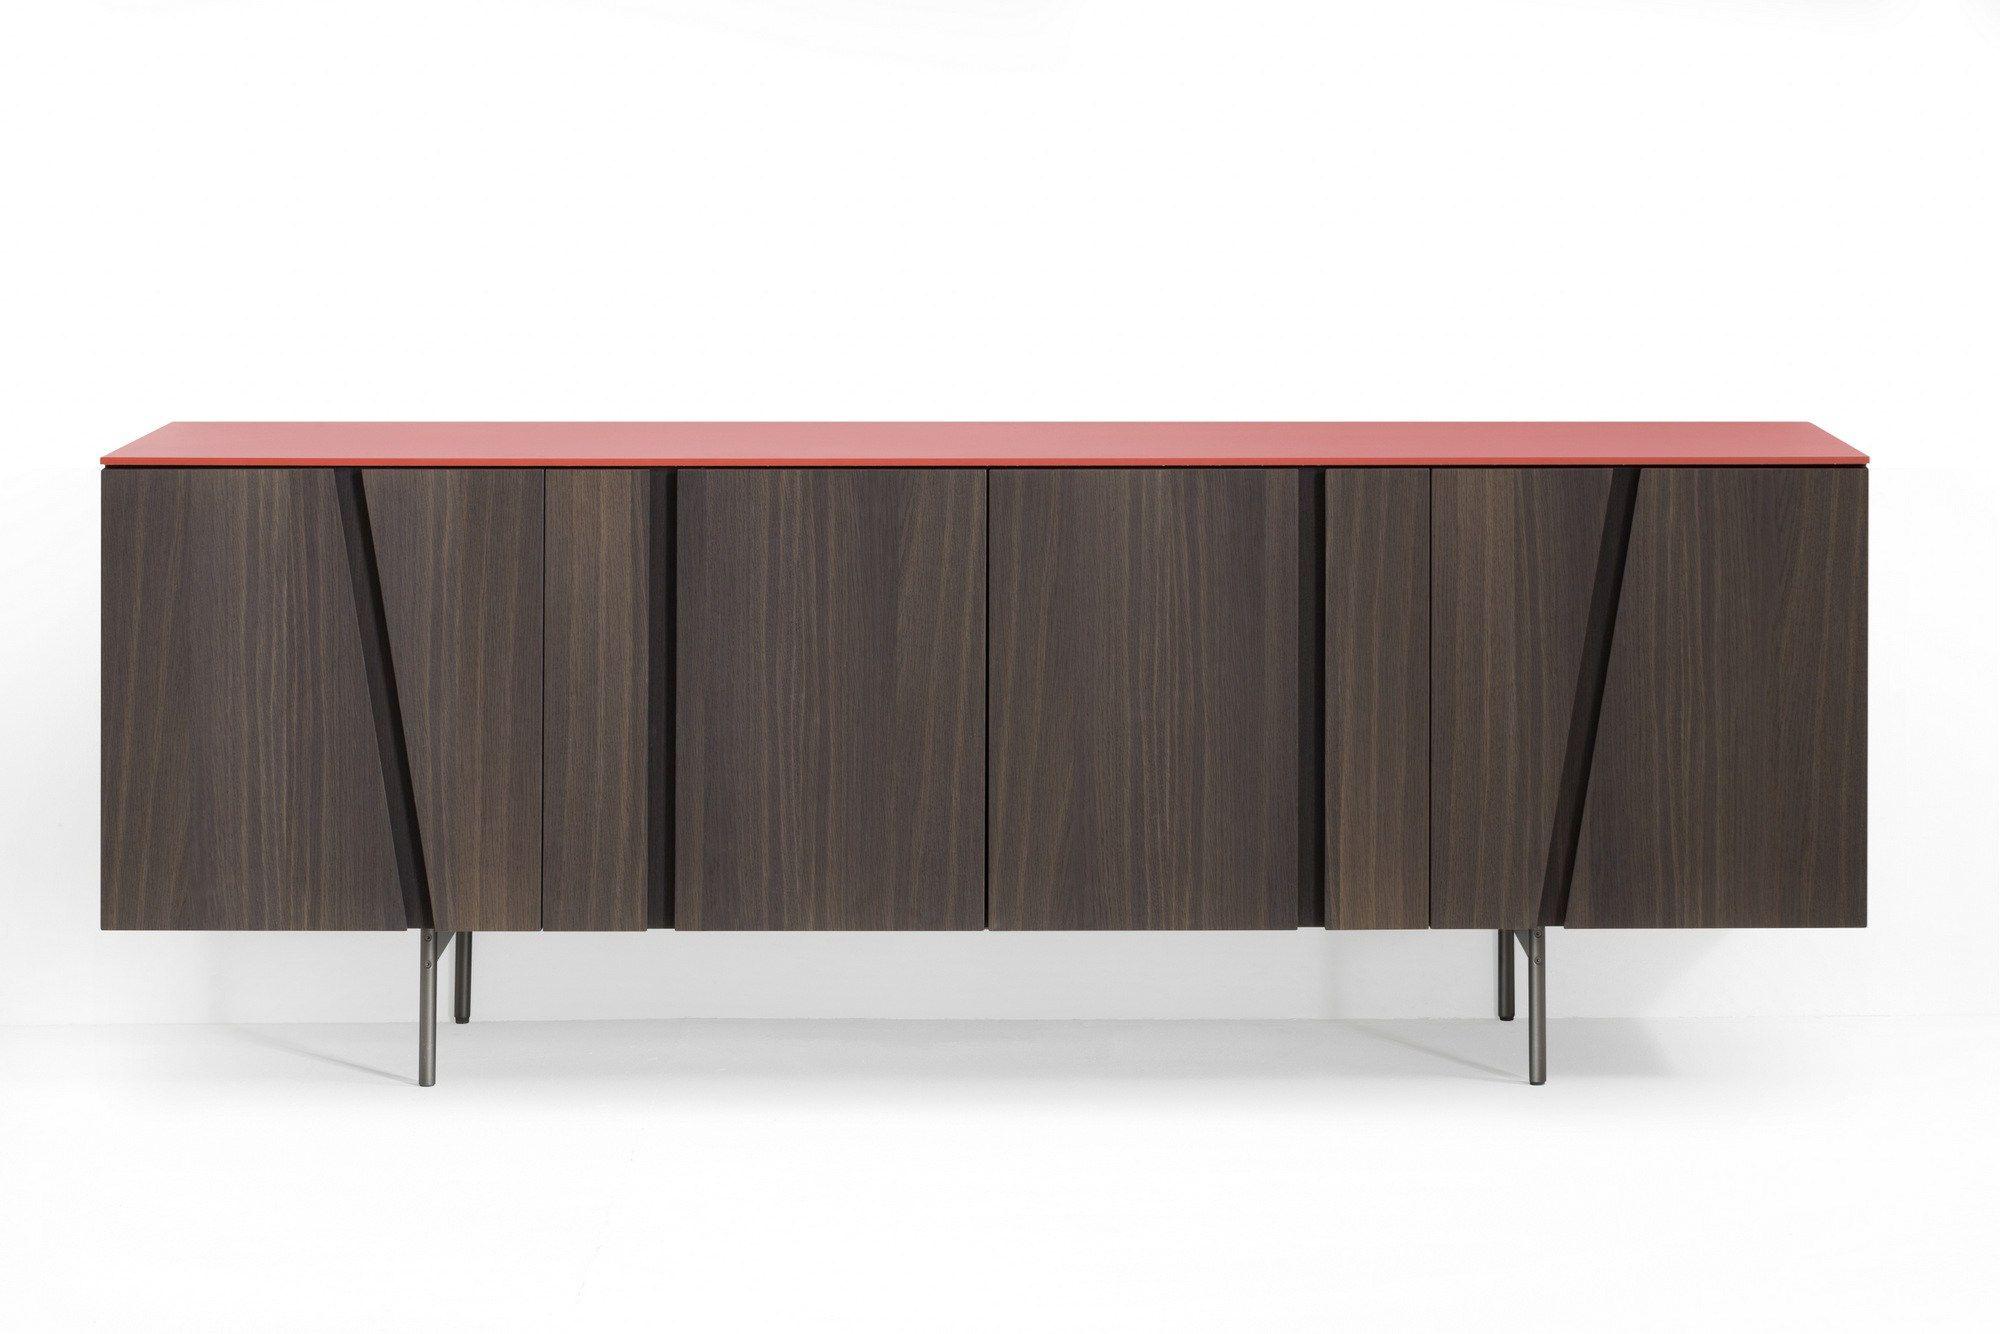 Oak Sideboard Picture By Lema Design Cairoli F U R N I T U R E  # Menuiserie:Download Images Meubles Tv